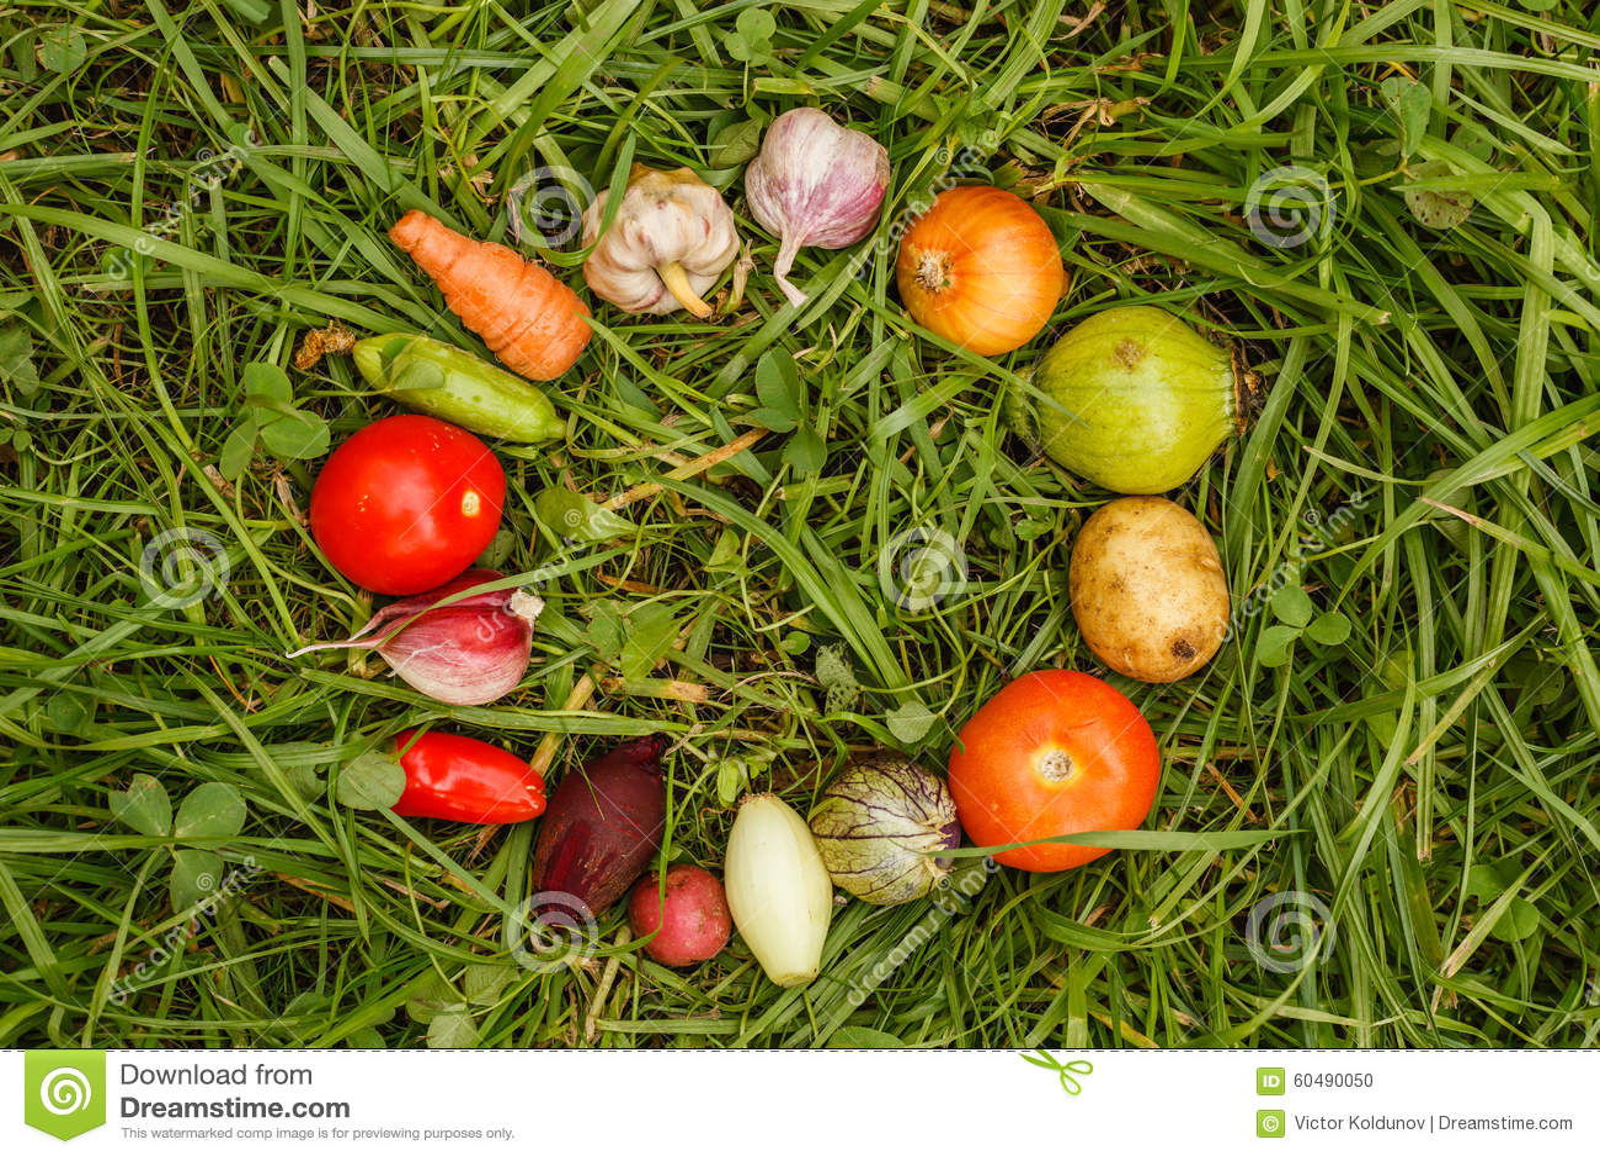 Healthy Harvest Natural Foods